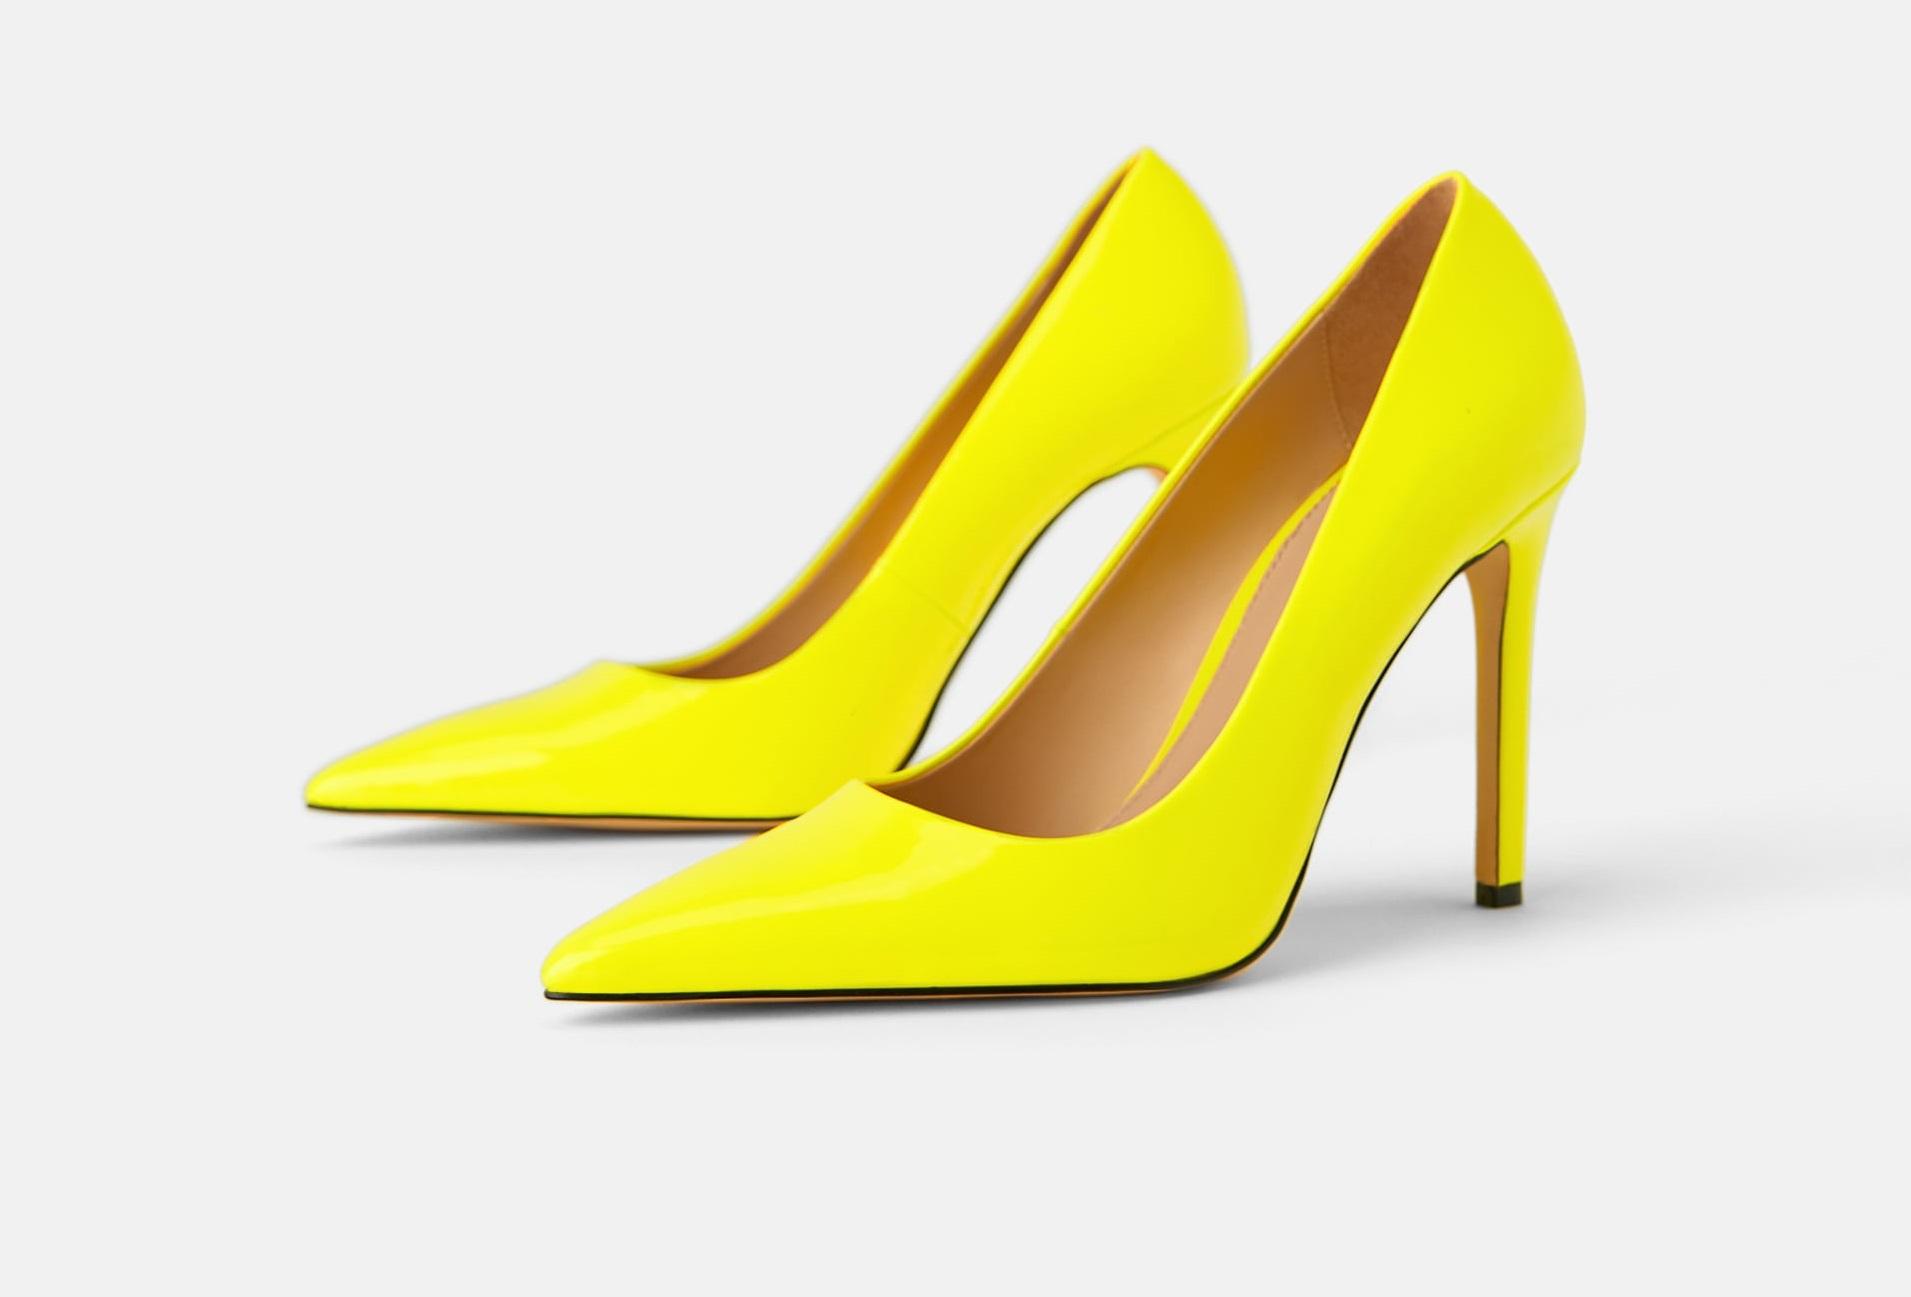 scarpe sportive 3a7de 61795 Scarpe Zara Primavera 2019: tronchetti a punta, sandali fluo ...